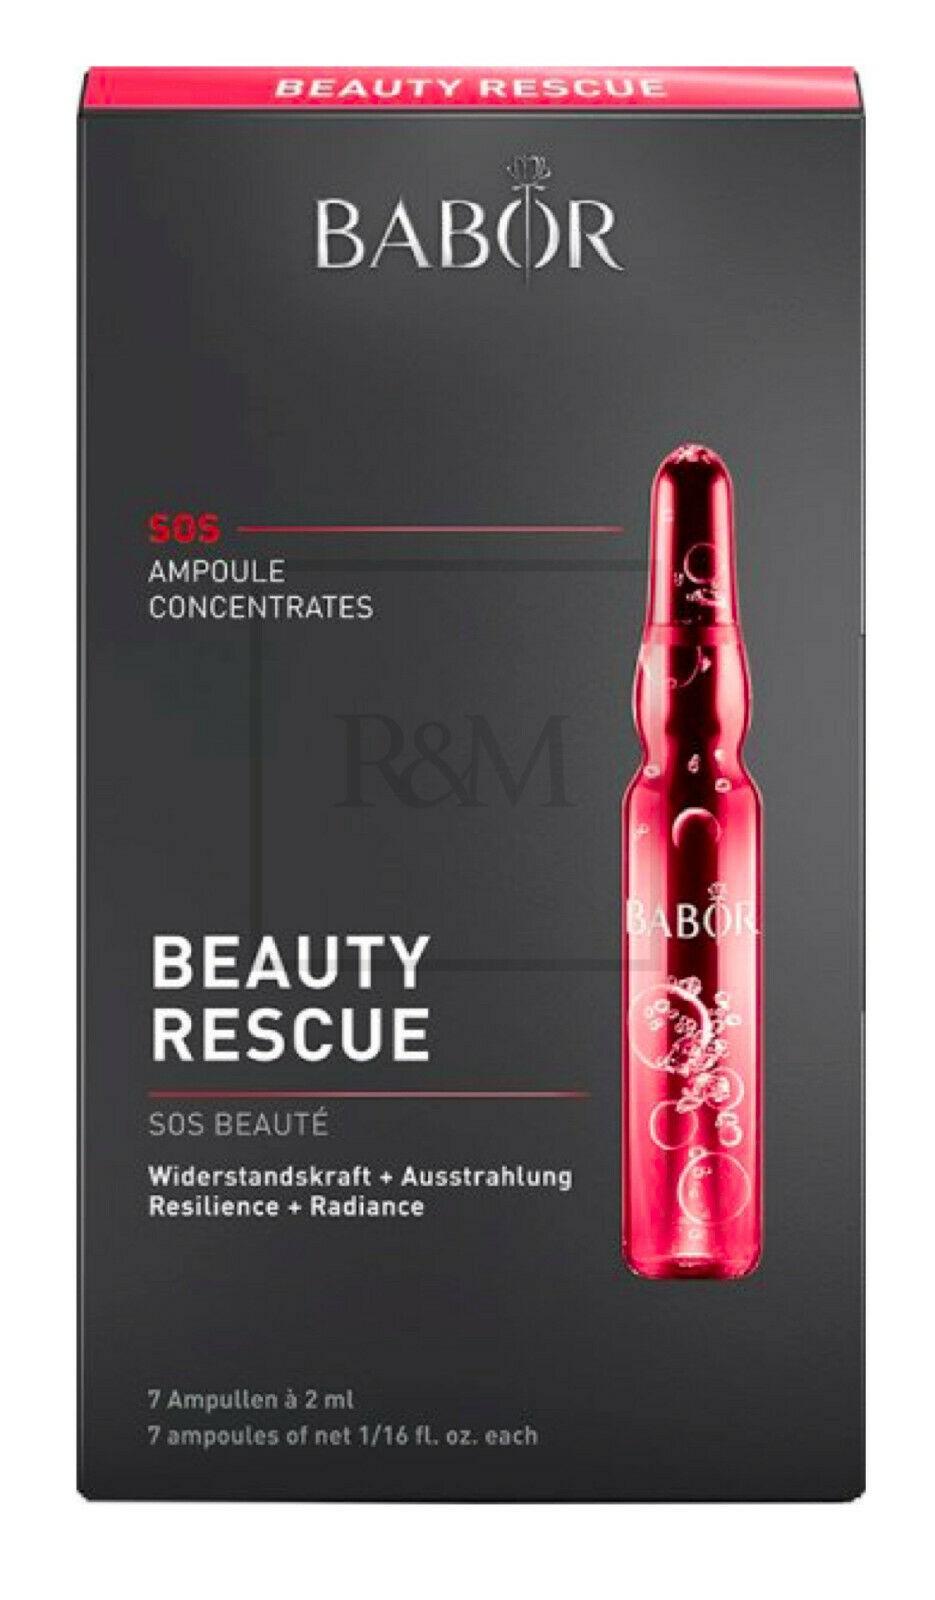 Beauty Rescue Babor Германия — фото №1